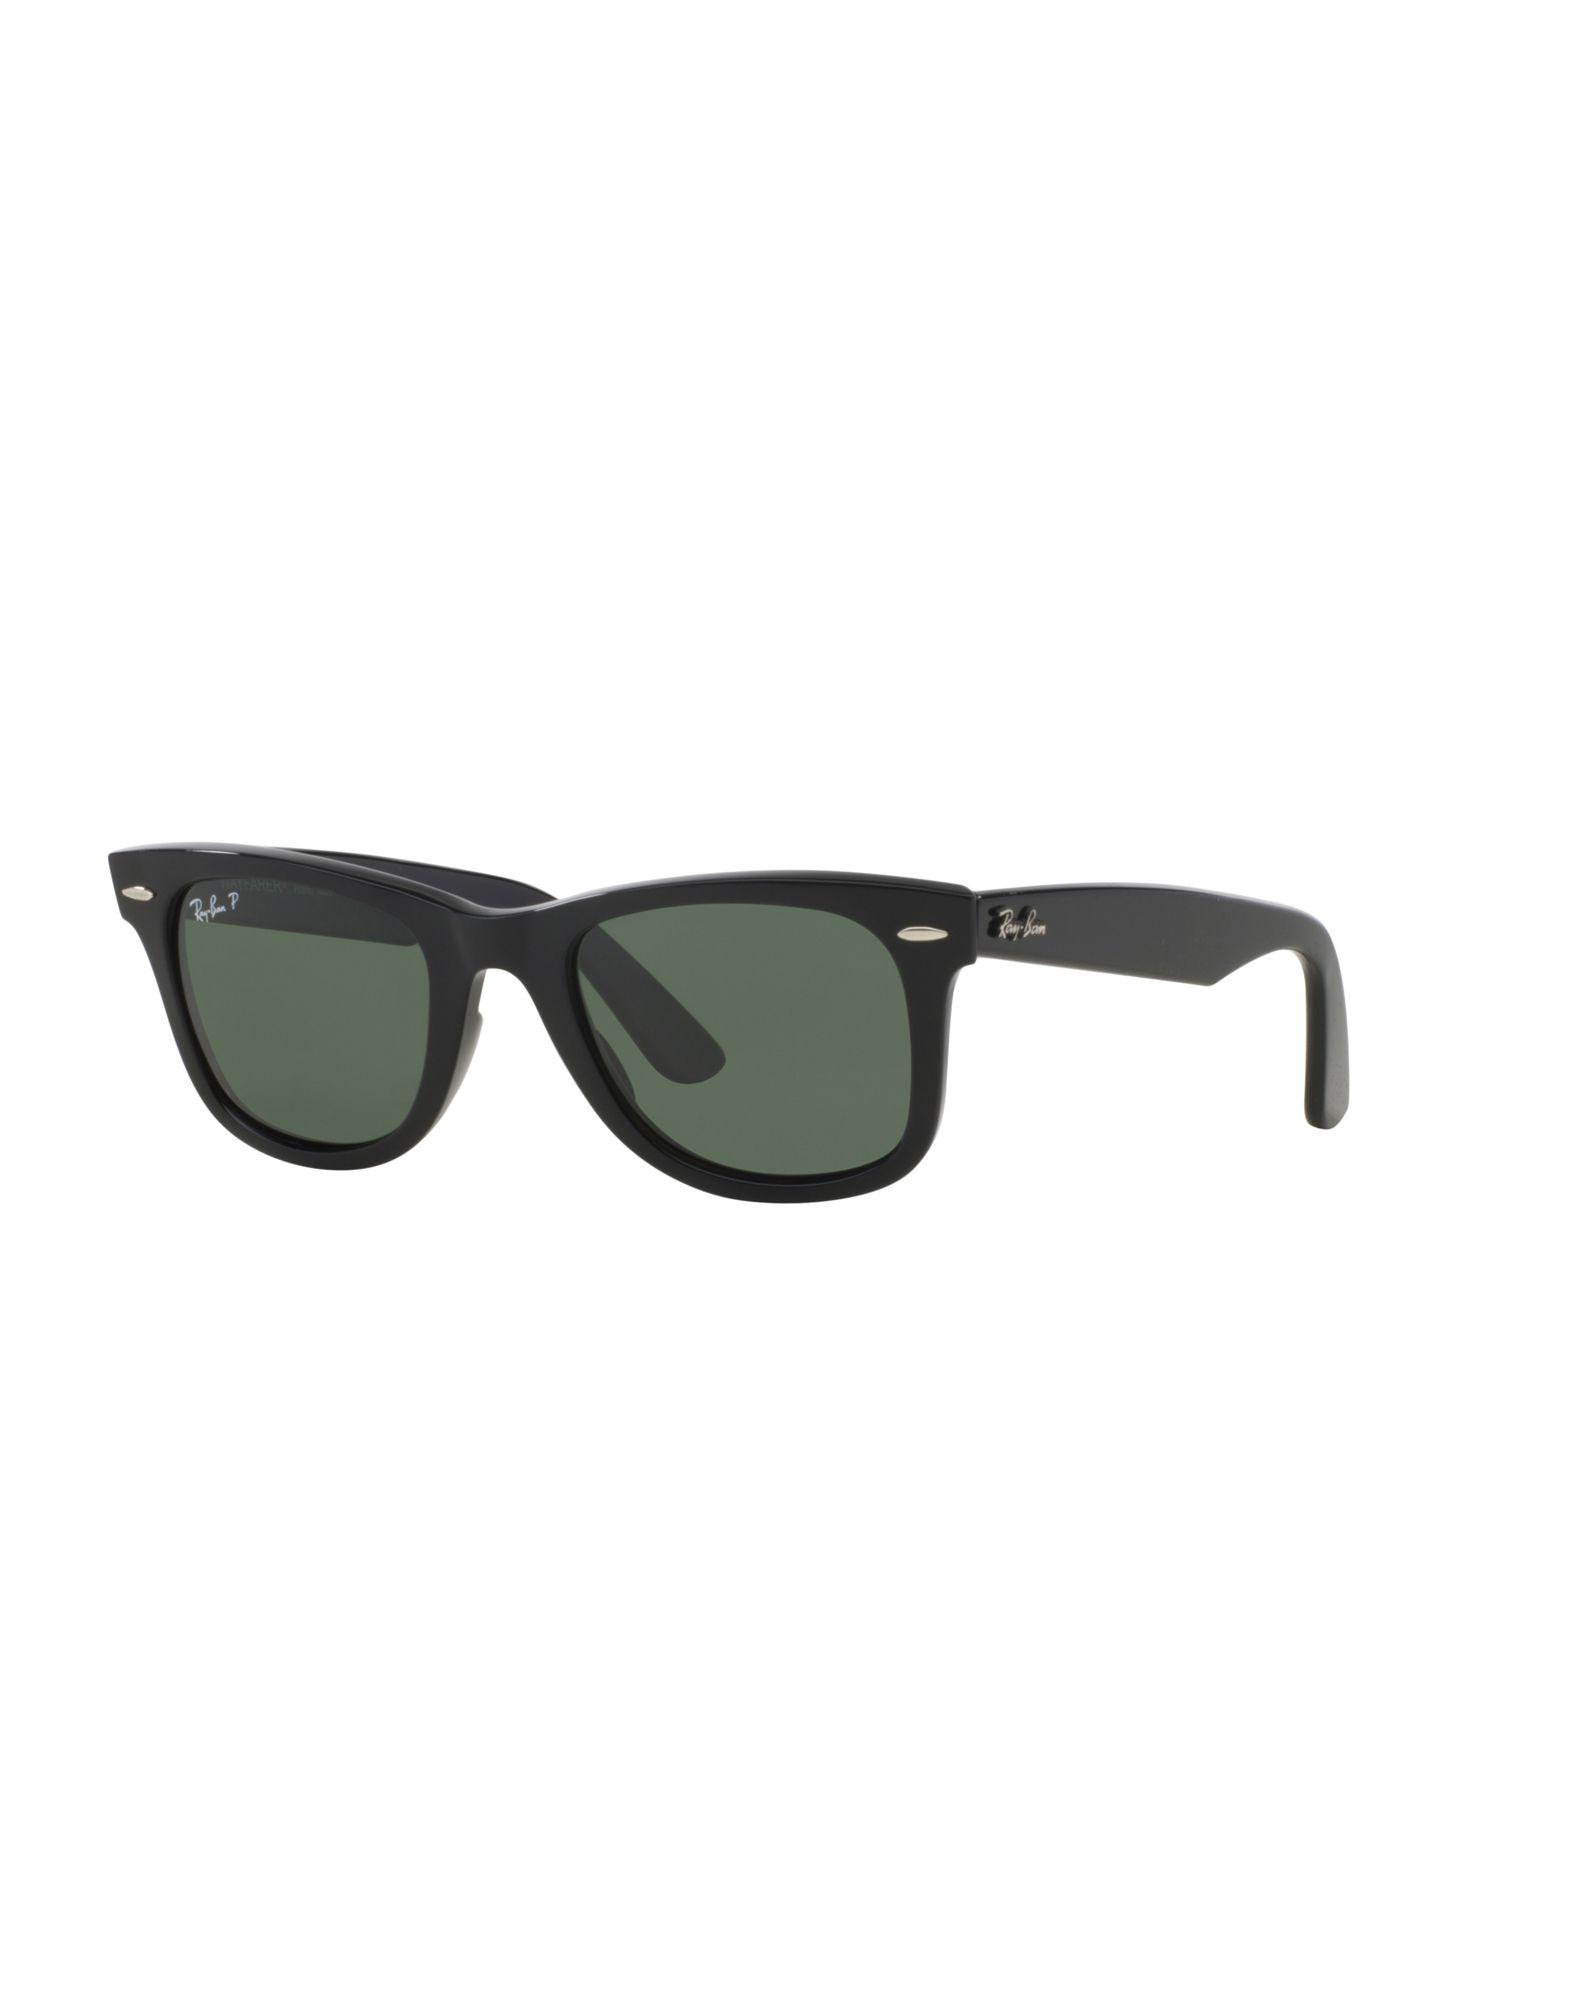 Occhiali Da Sole Ray-Ban Rb2140 Original Wayfarer - Uomo - Acquista online su